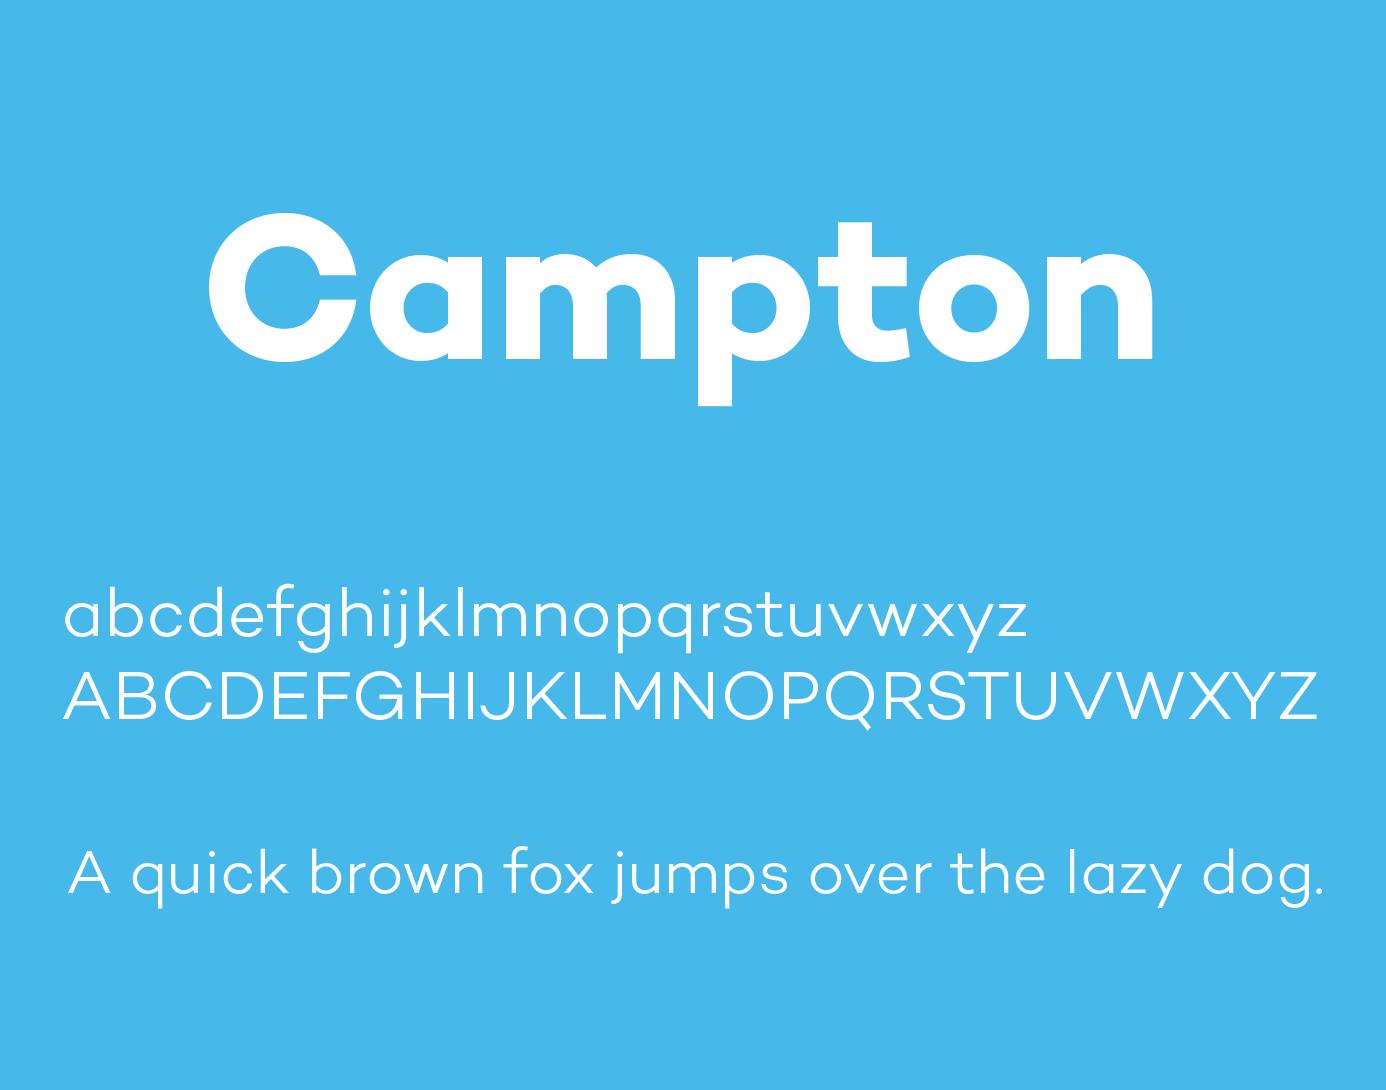 https://fontclarity.com/wp-content/uploads/2019/09/campton-font-download-0.png Free Download